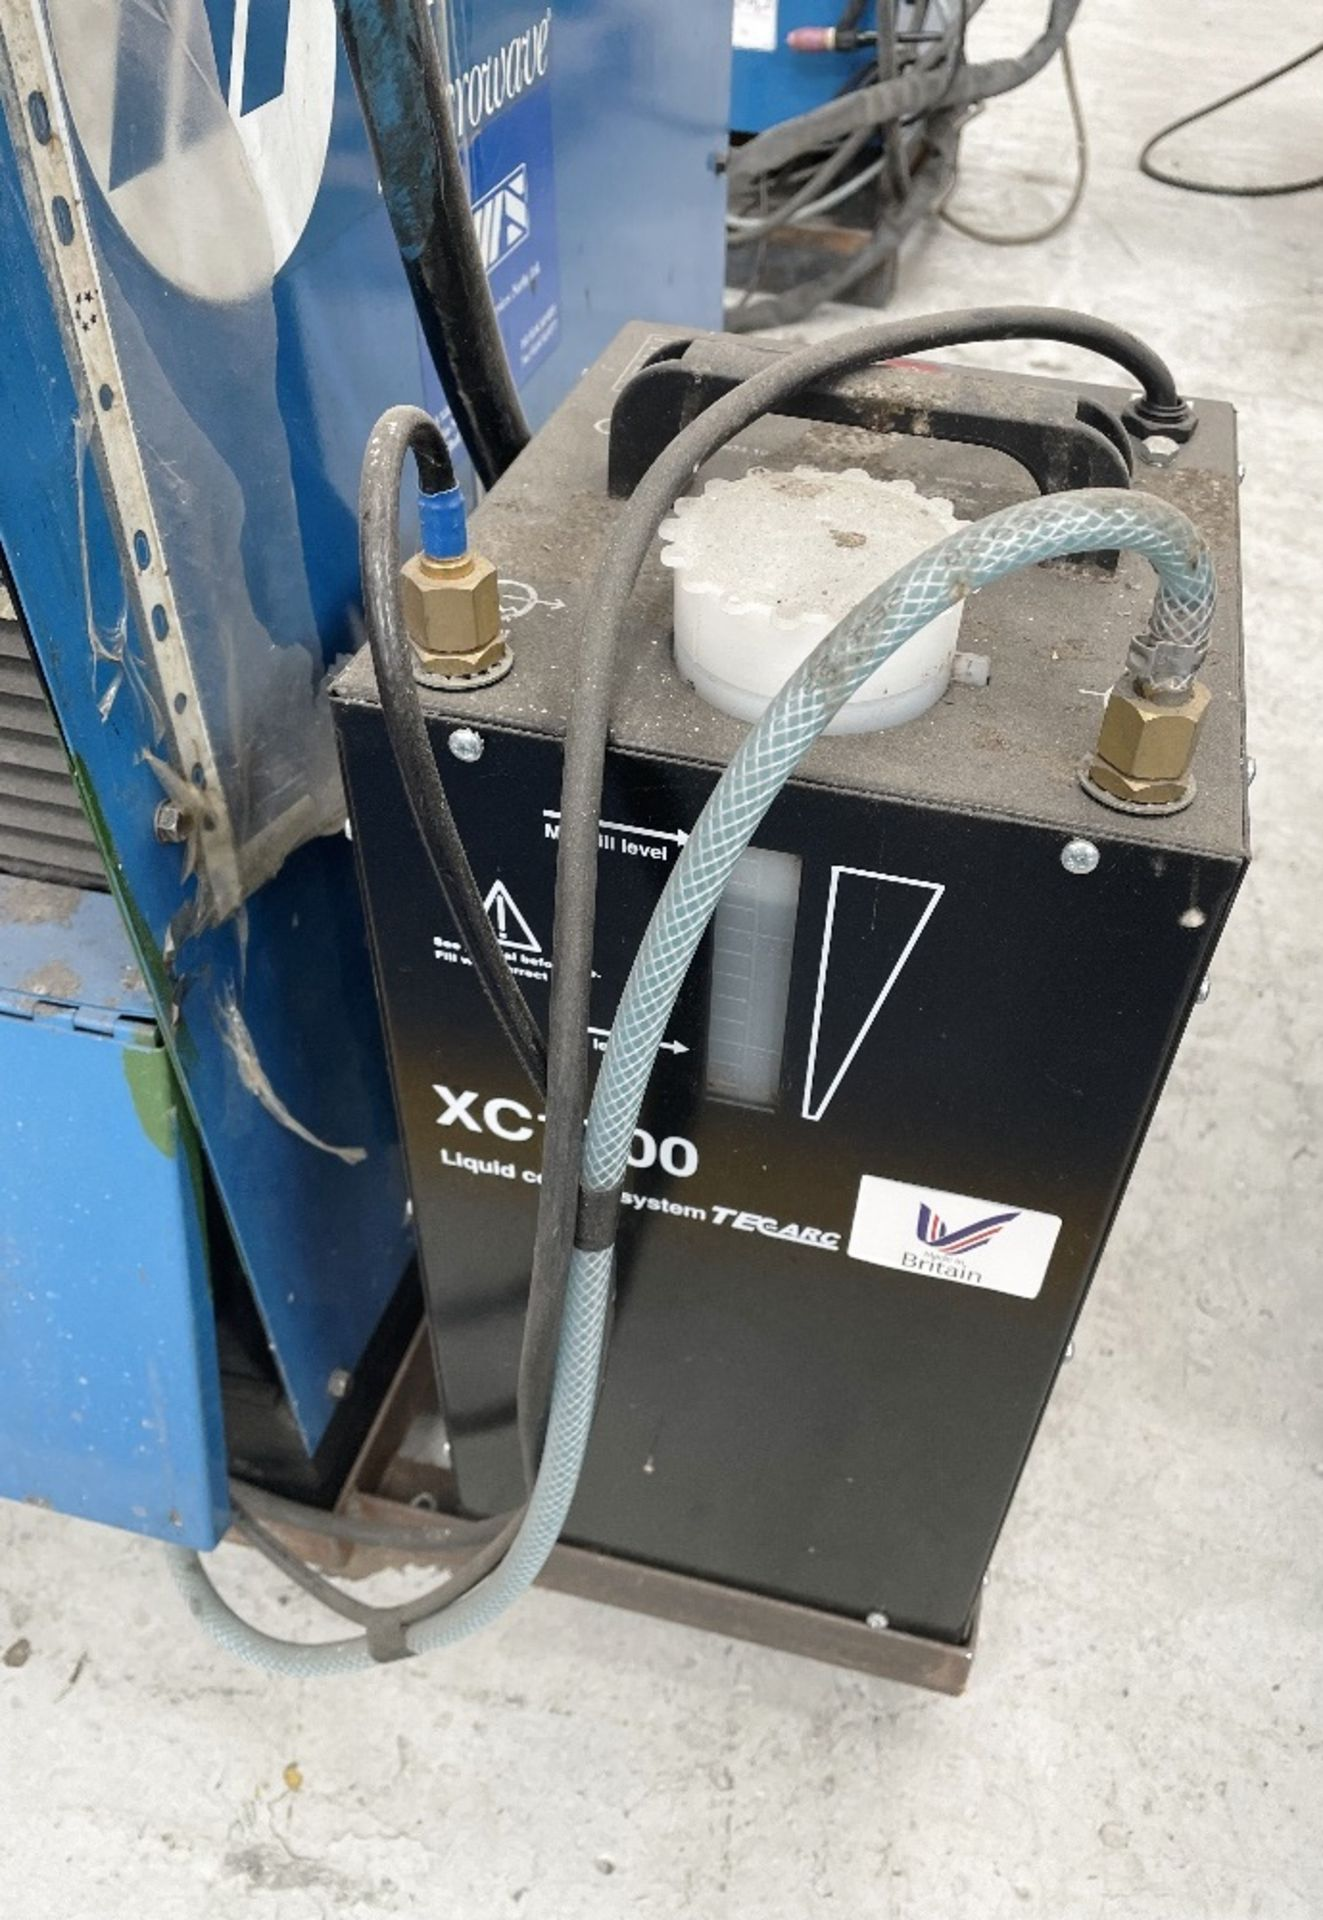 Miller Syncrowave 250 Tig Welder w/ TecArc XC1000 Water Cooler - Image 3 of 6